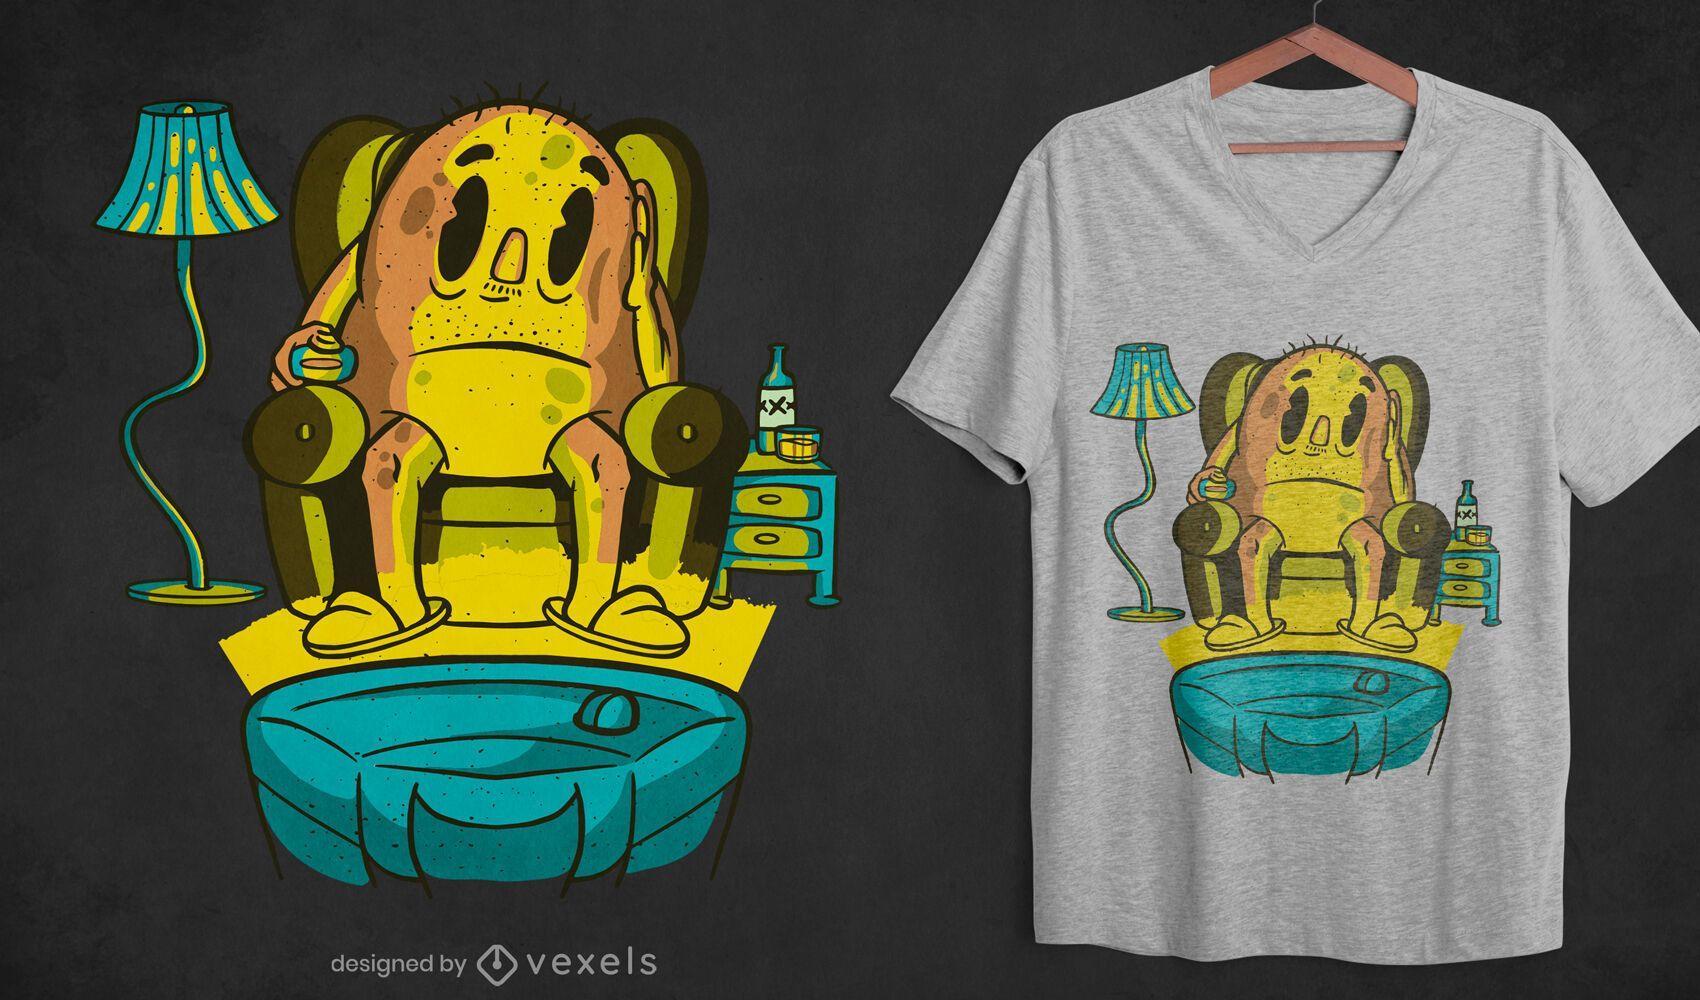 Potato zapping t-shirt design